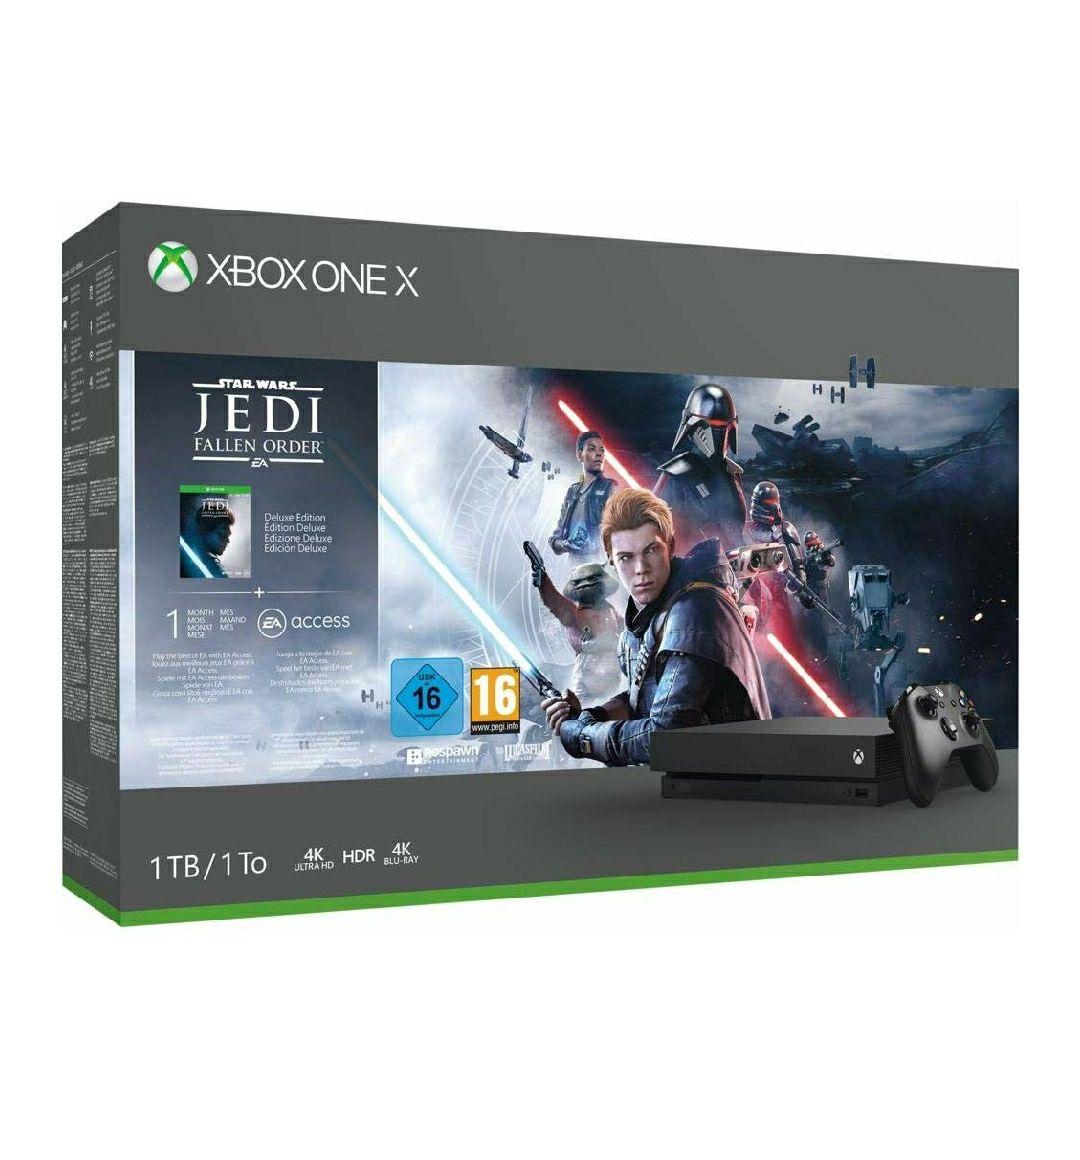 Microsoft Xbox one X 1 tb, mando inalámbrico + Star Wars Jedi Fallen Order